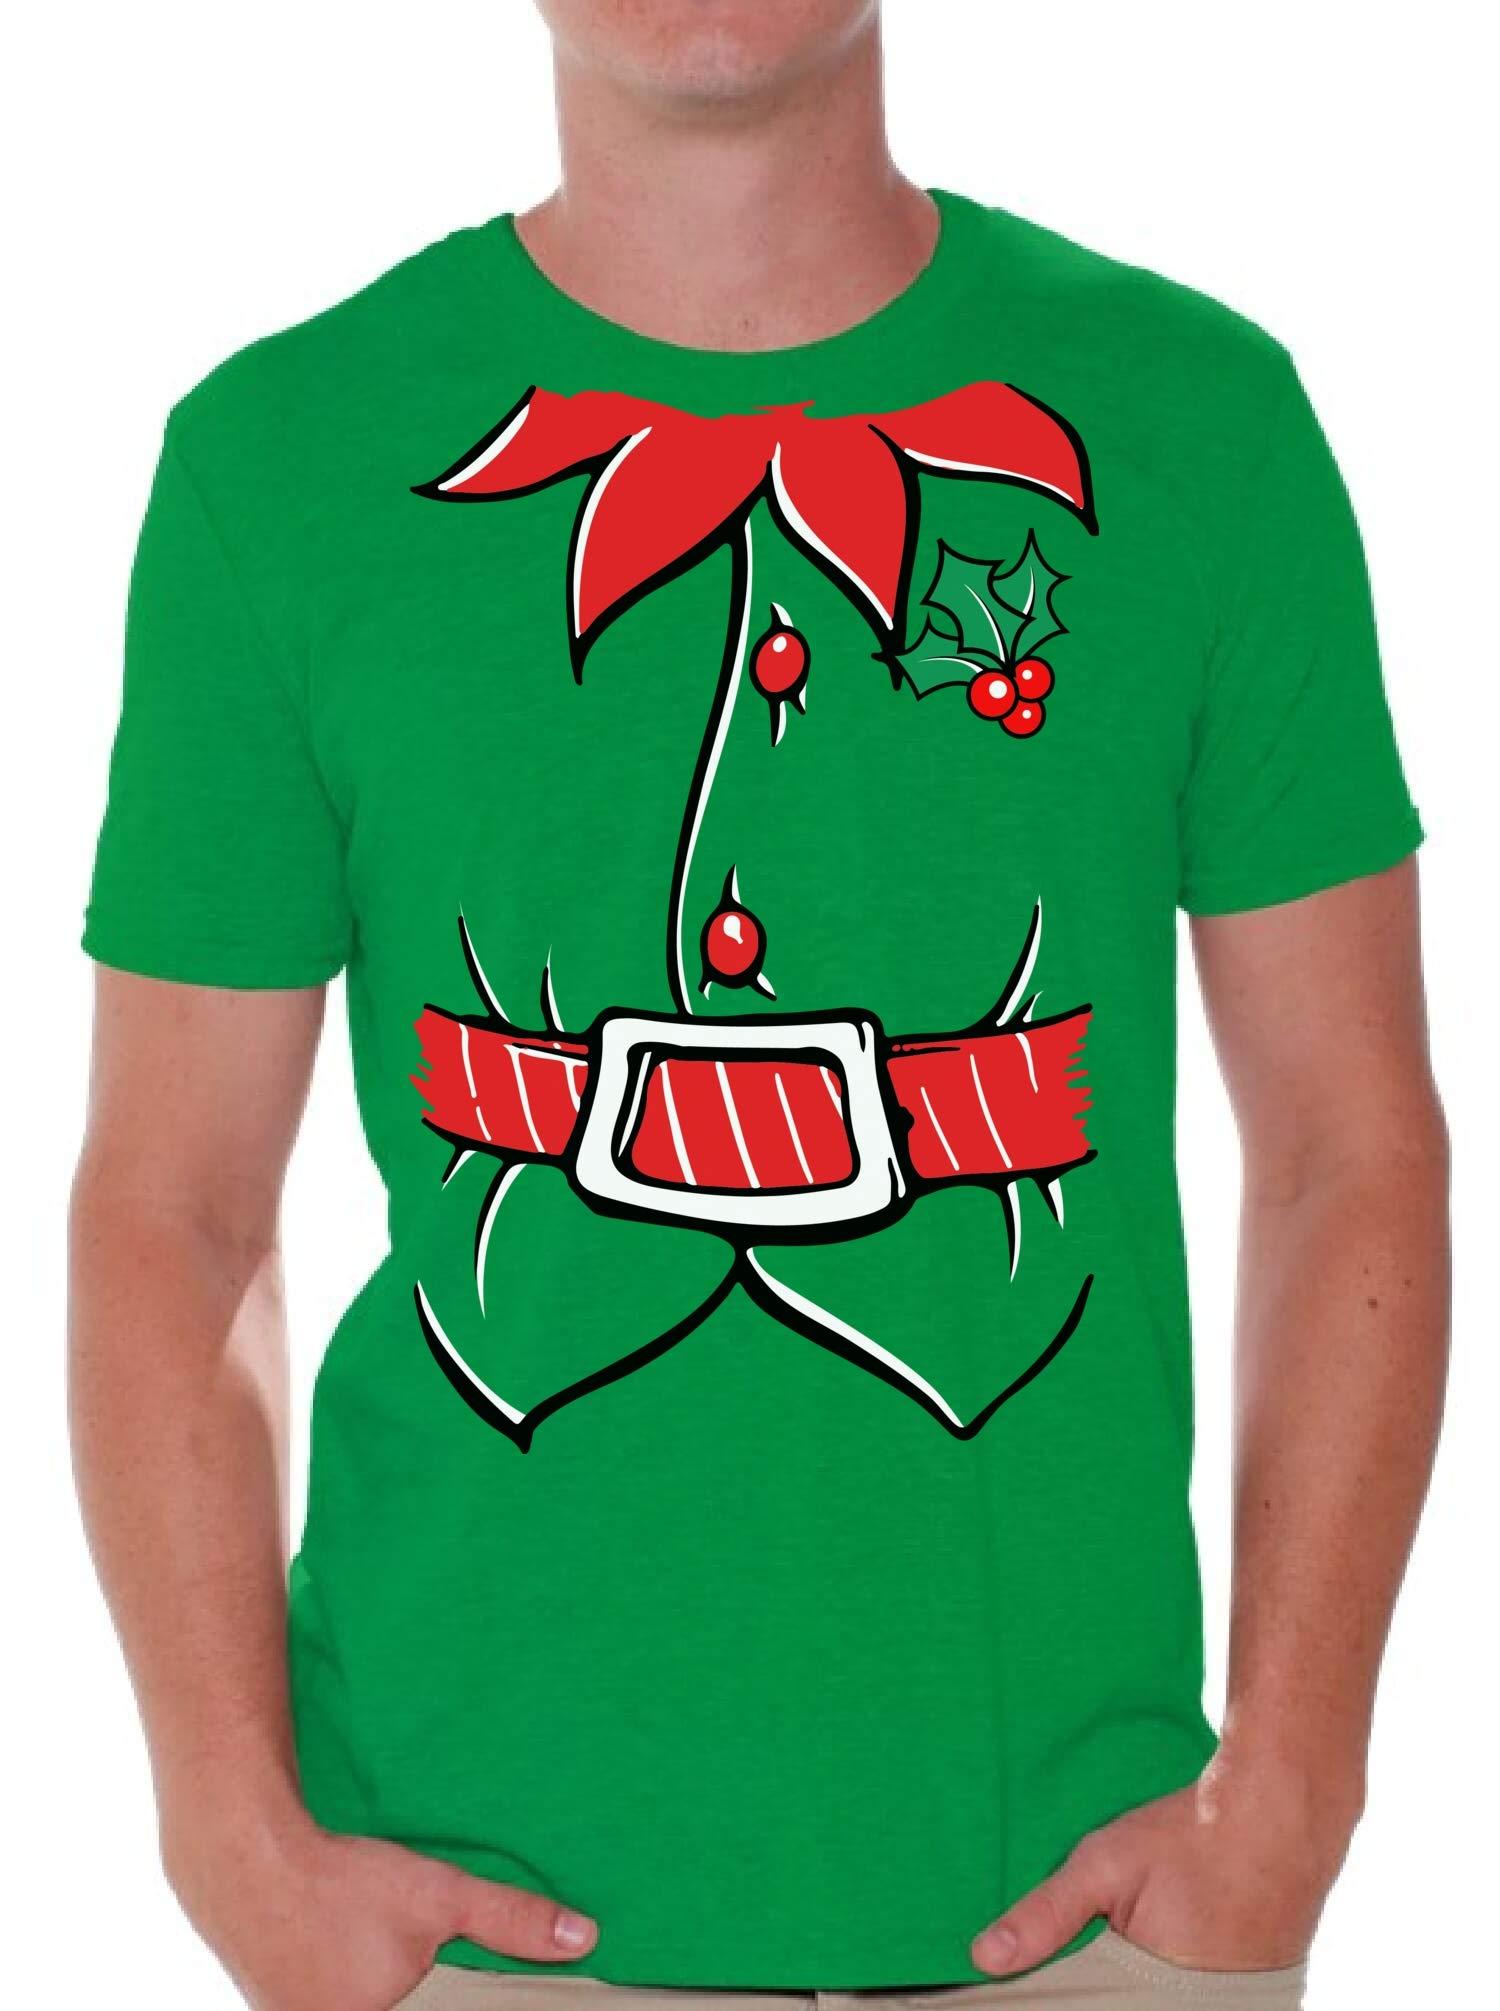 Awkwardstyles Men's Elf Costume T-Shirt Santa Holiday Christmas Shirt